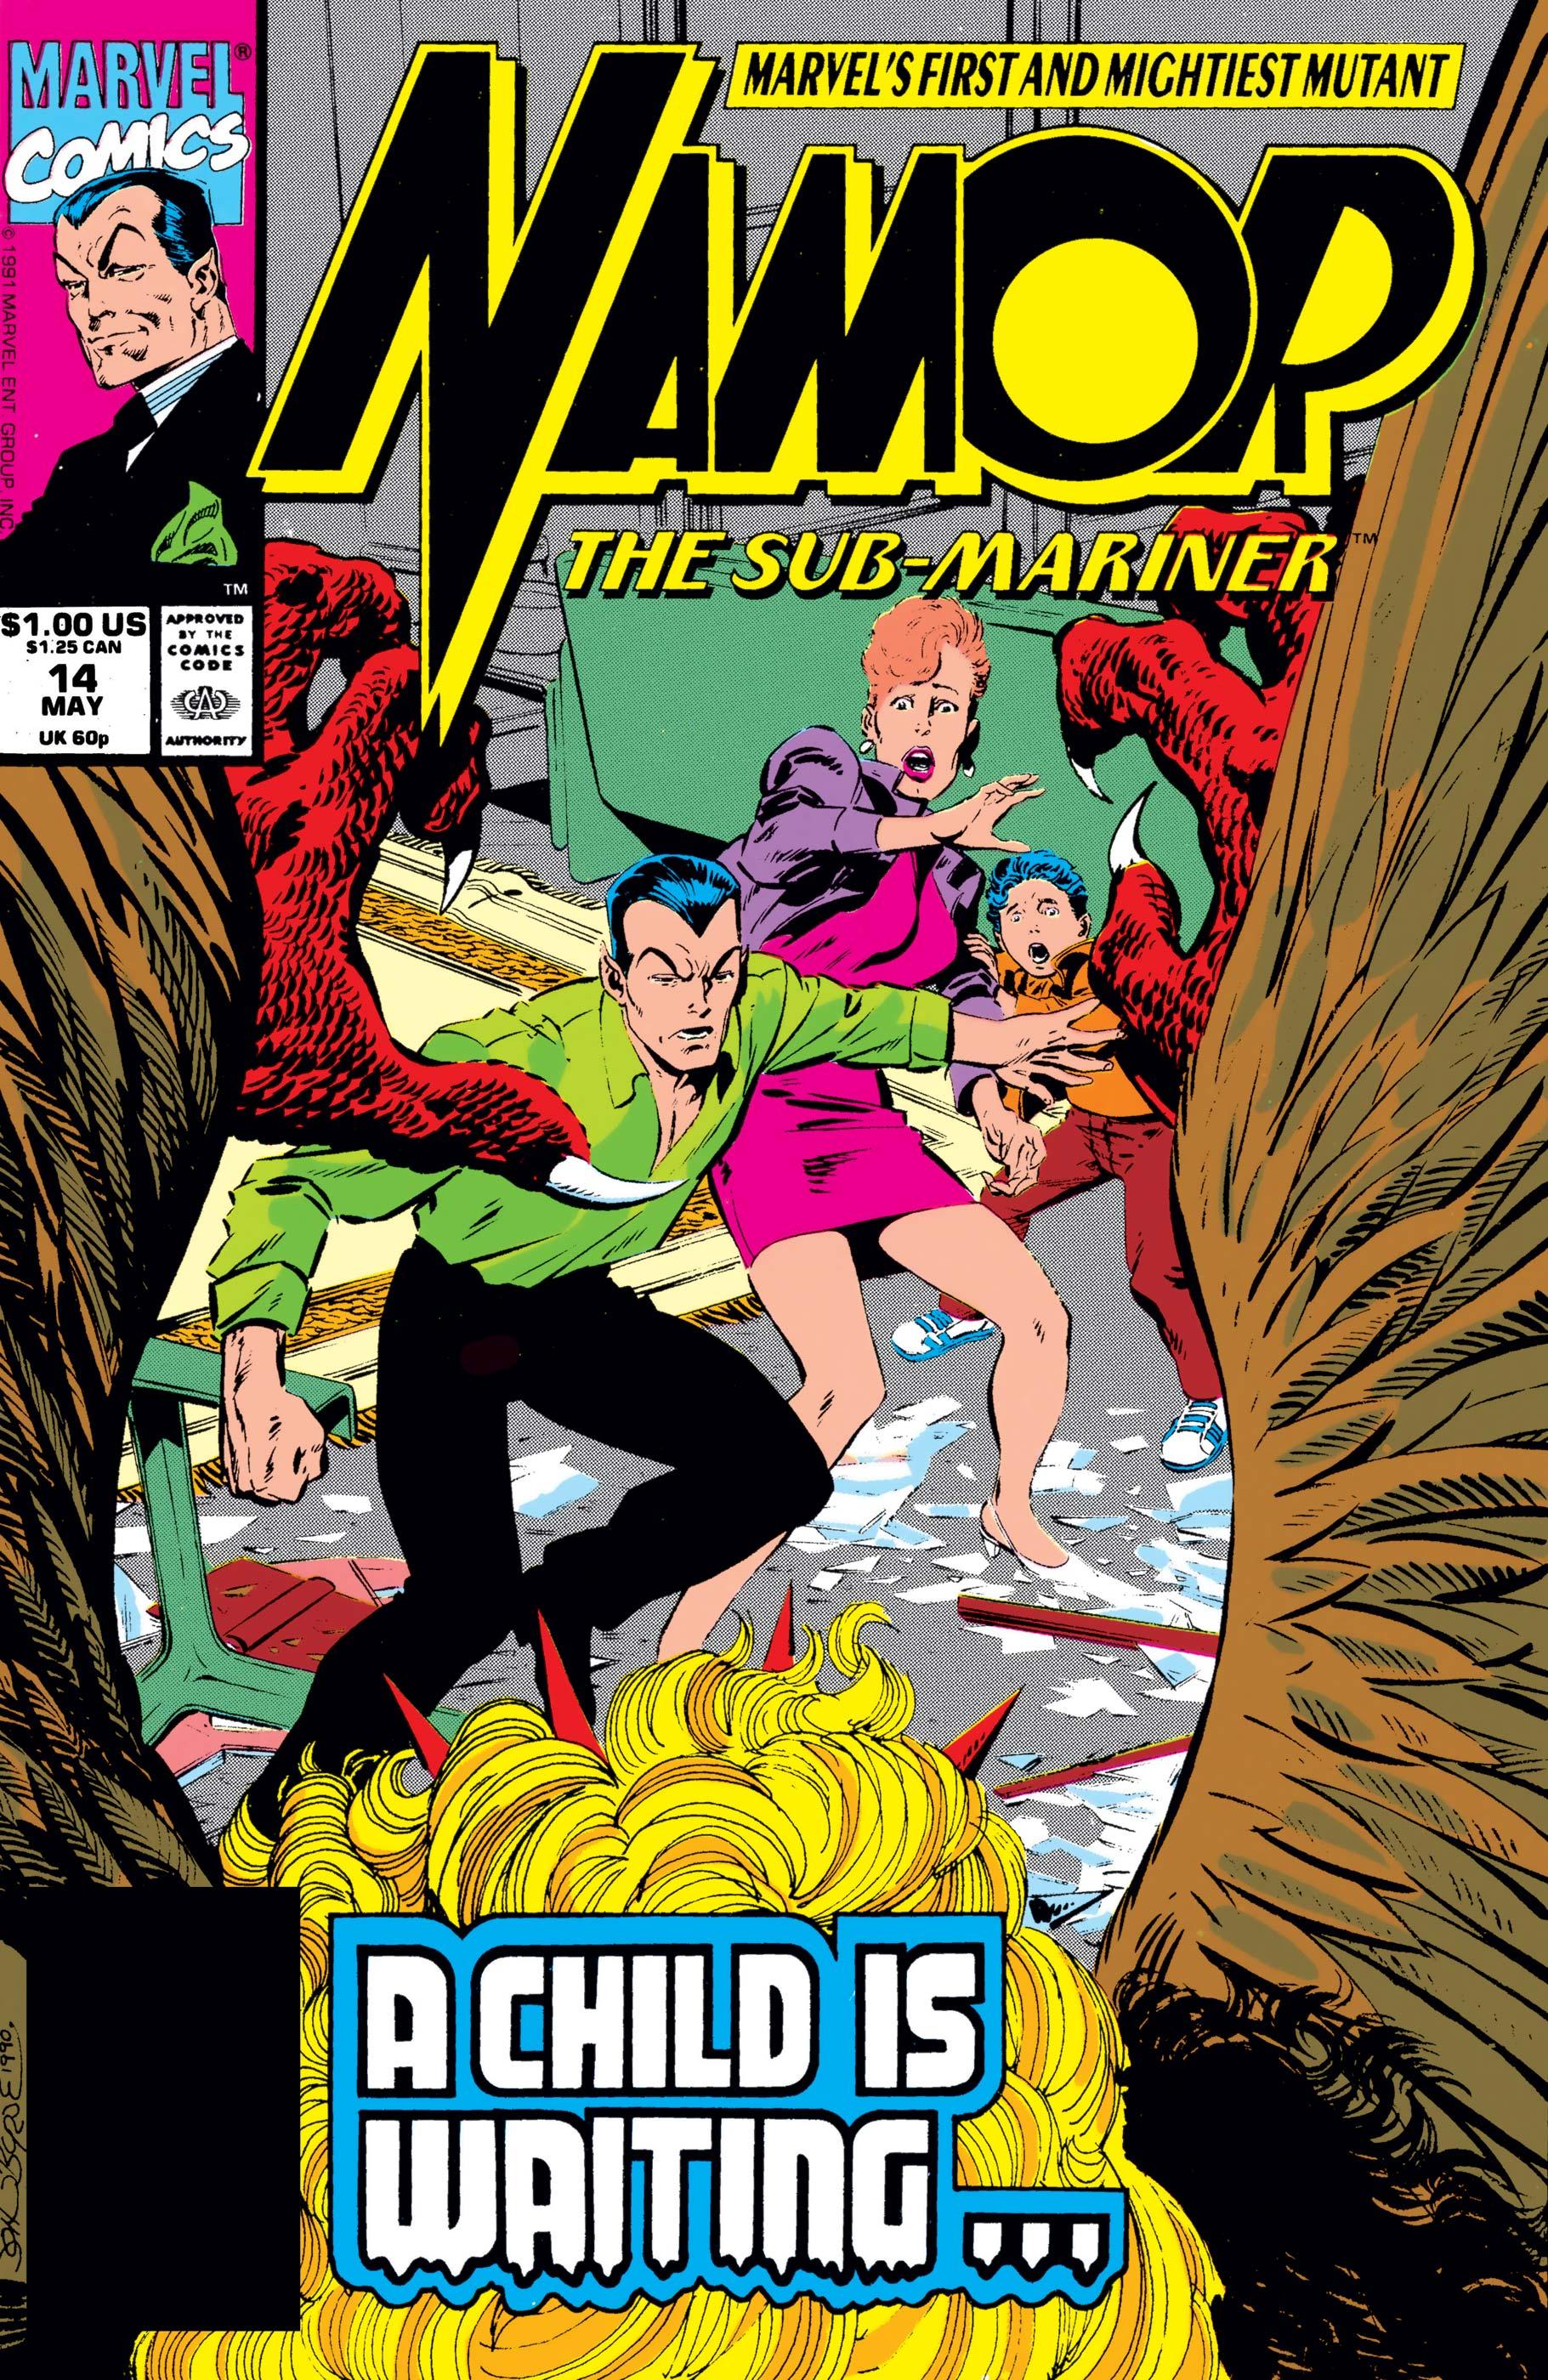 Namor: The Sub-Mariner (1990) #14